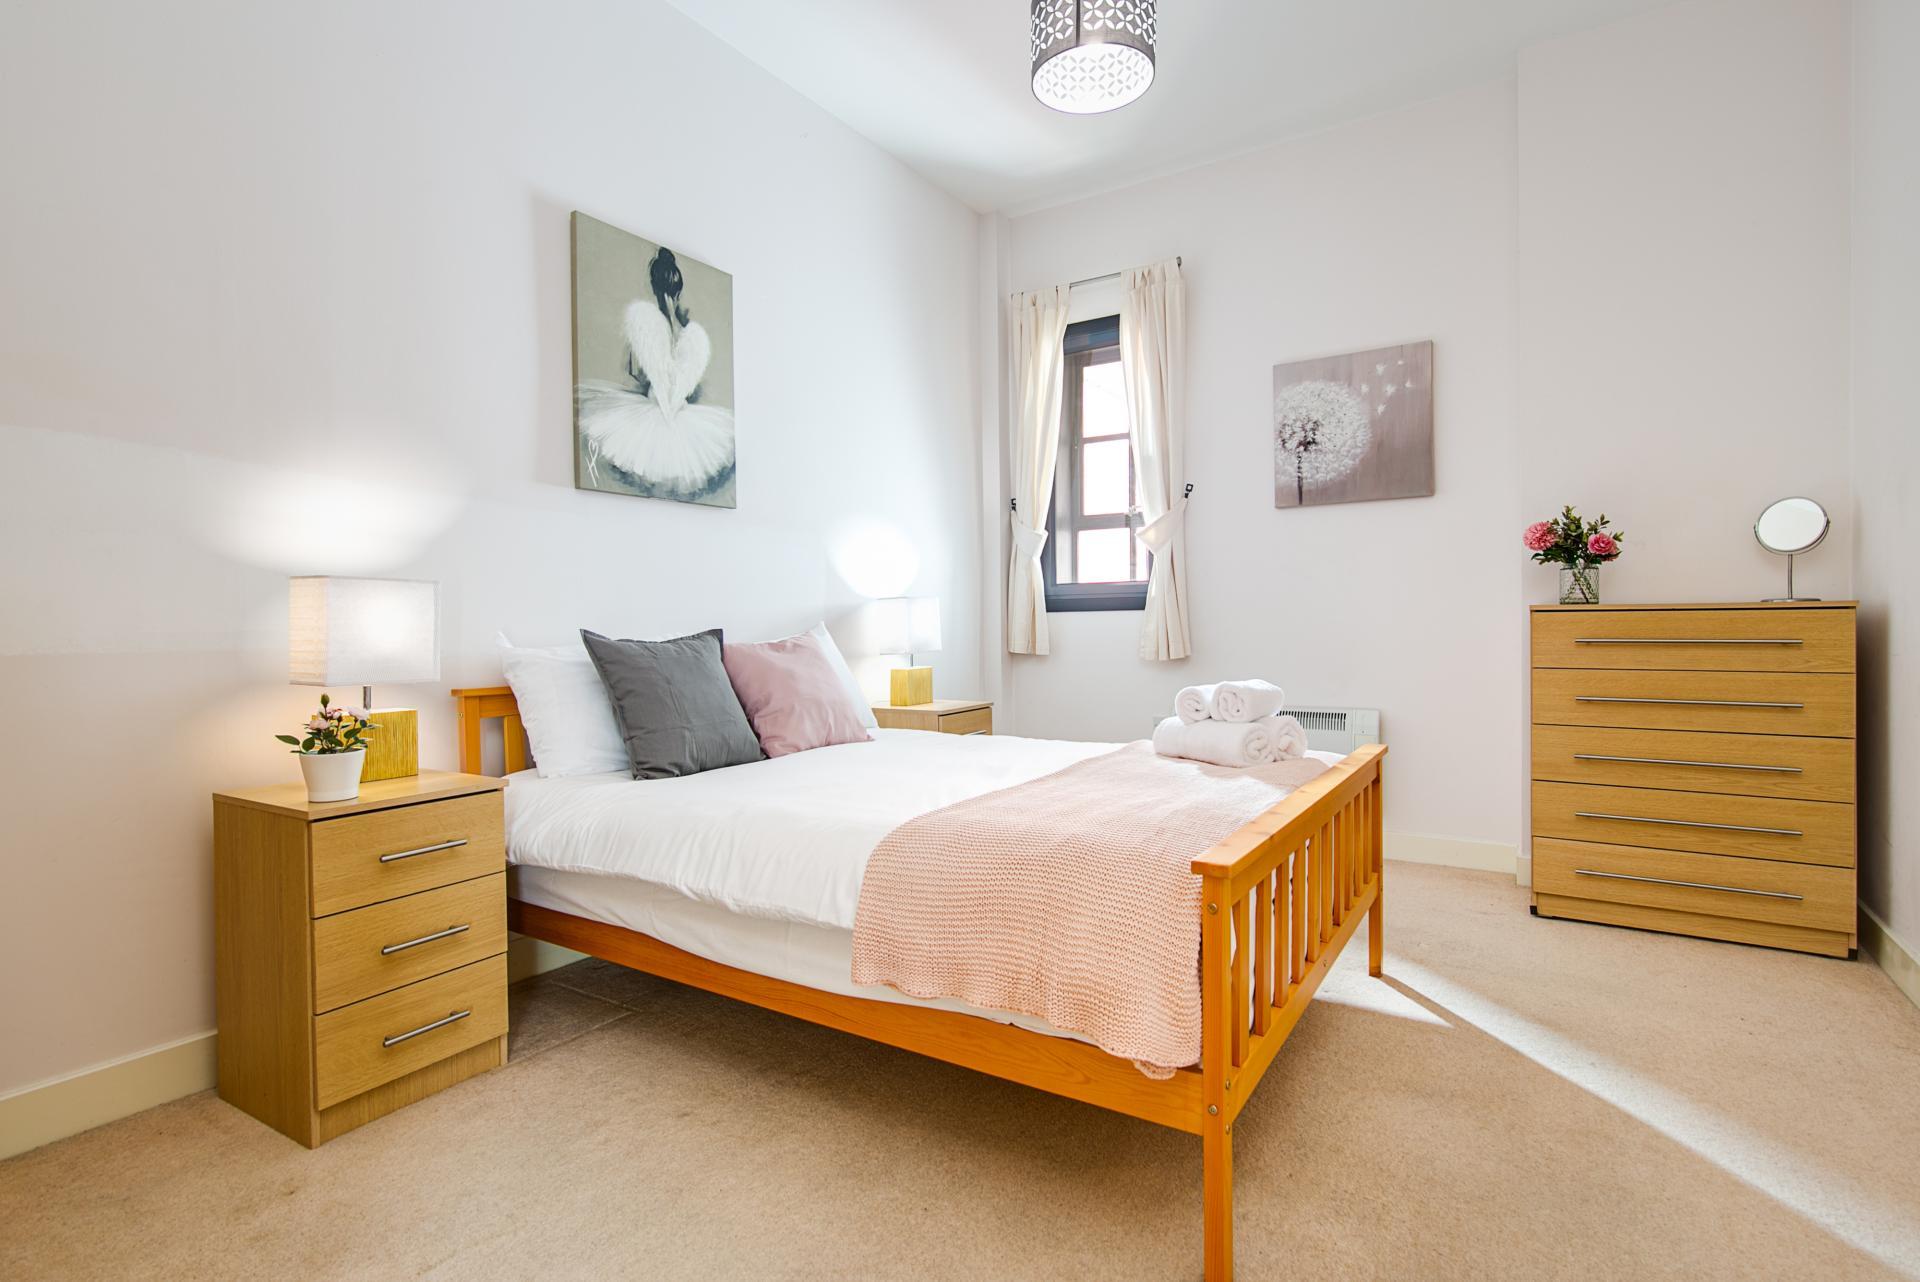 Bedroom at The Gem Apartment, Jewellery Quarter, Birmingham